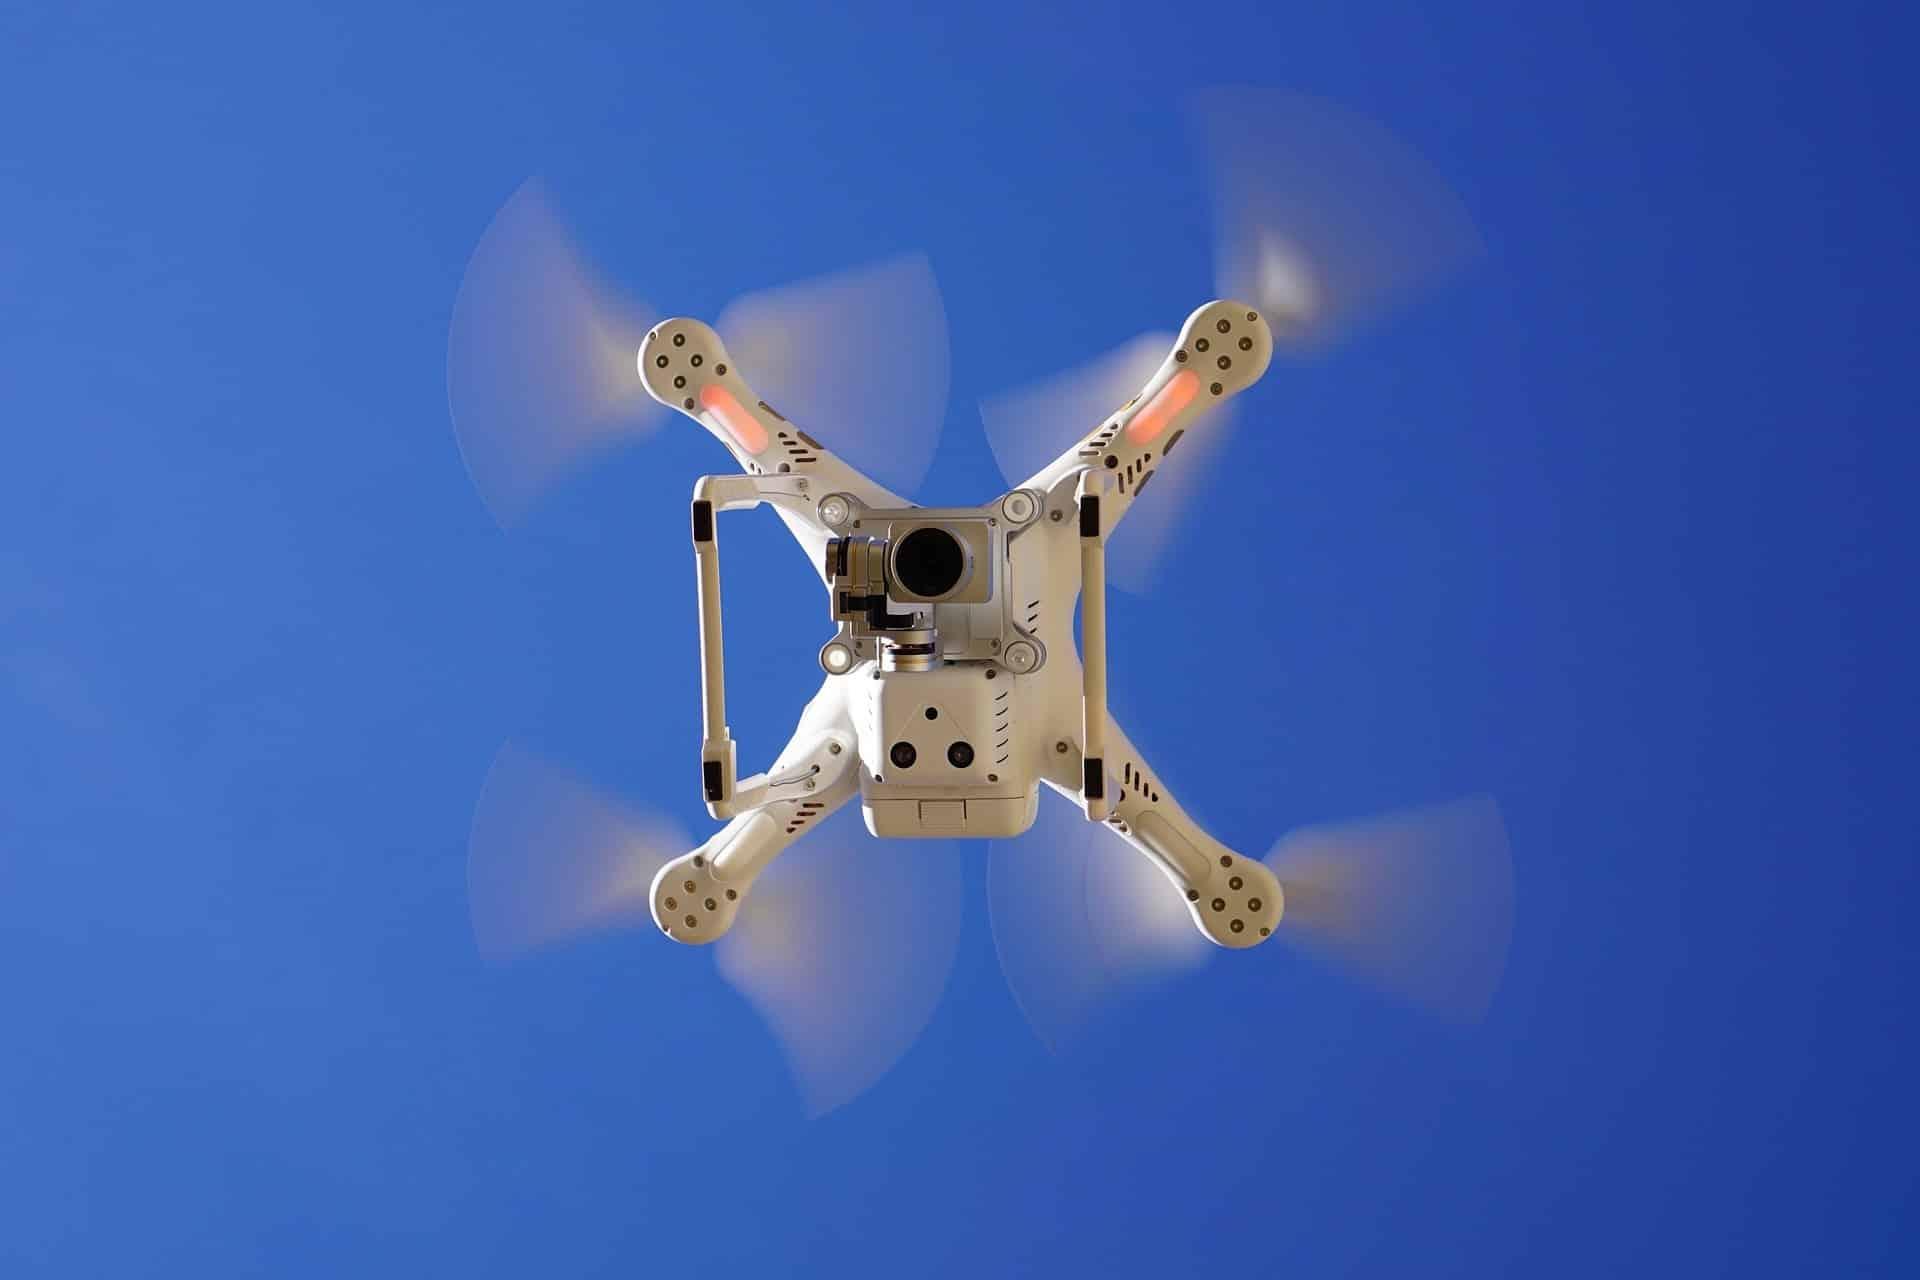 Drones για δημοσιογράφους: Μια ημερίδα